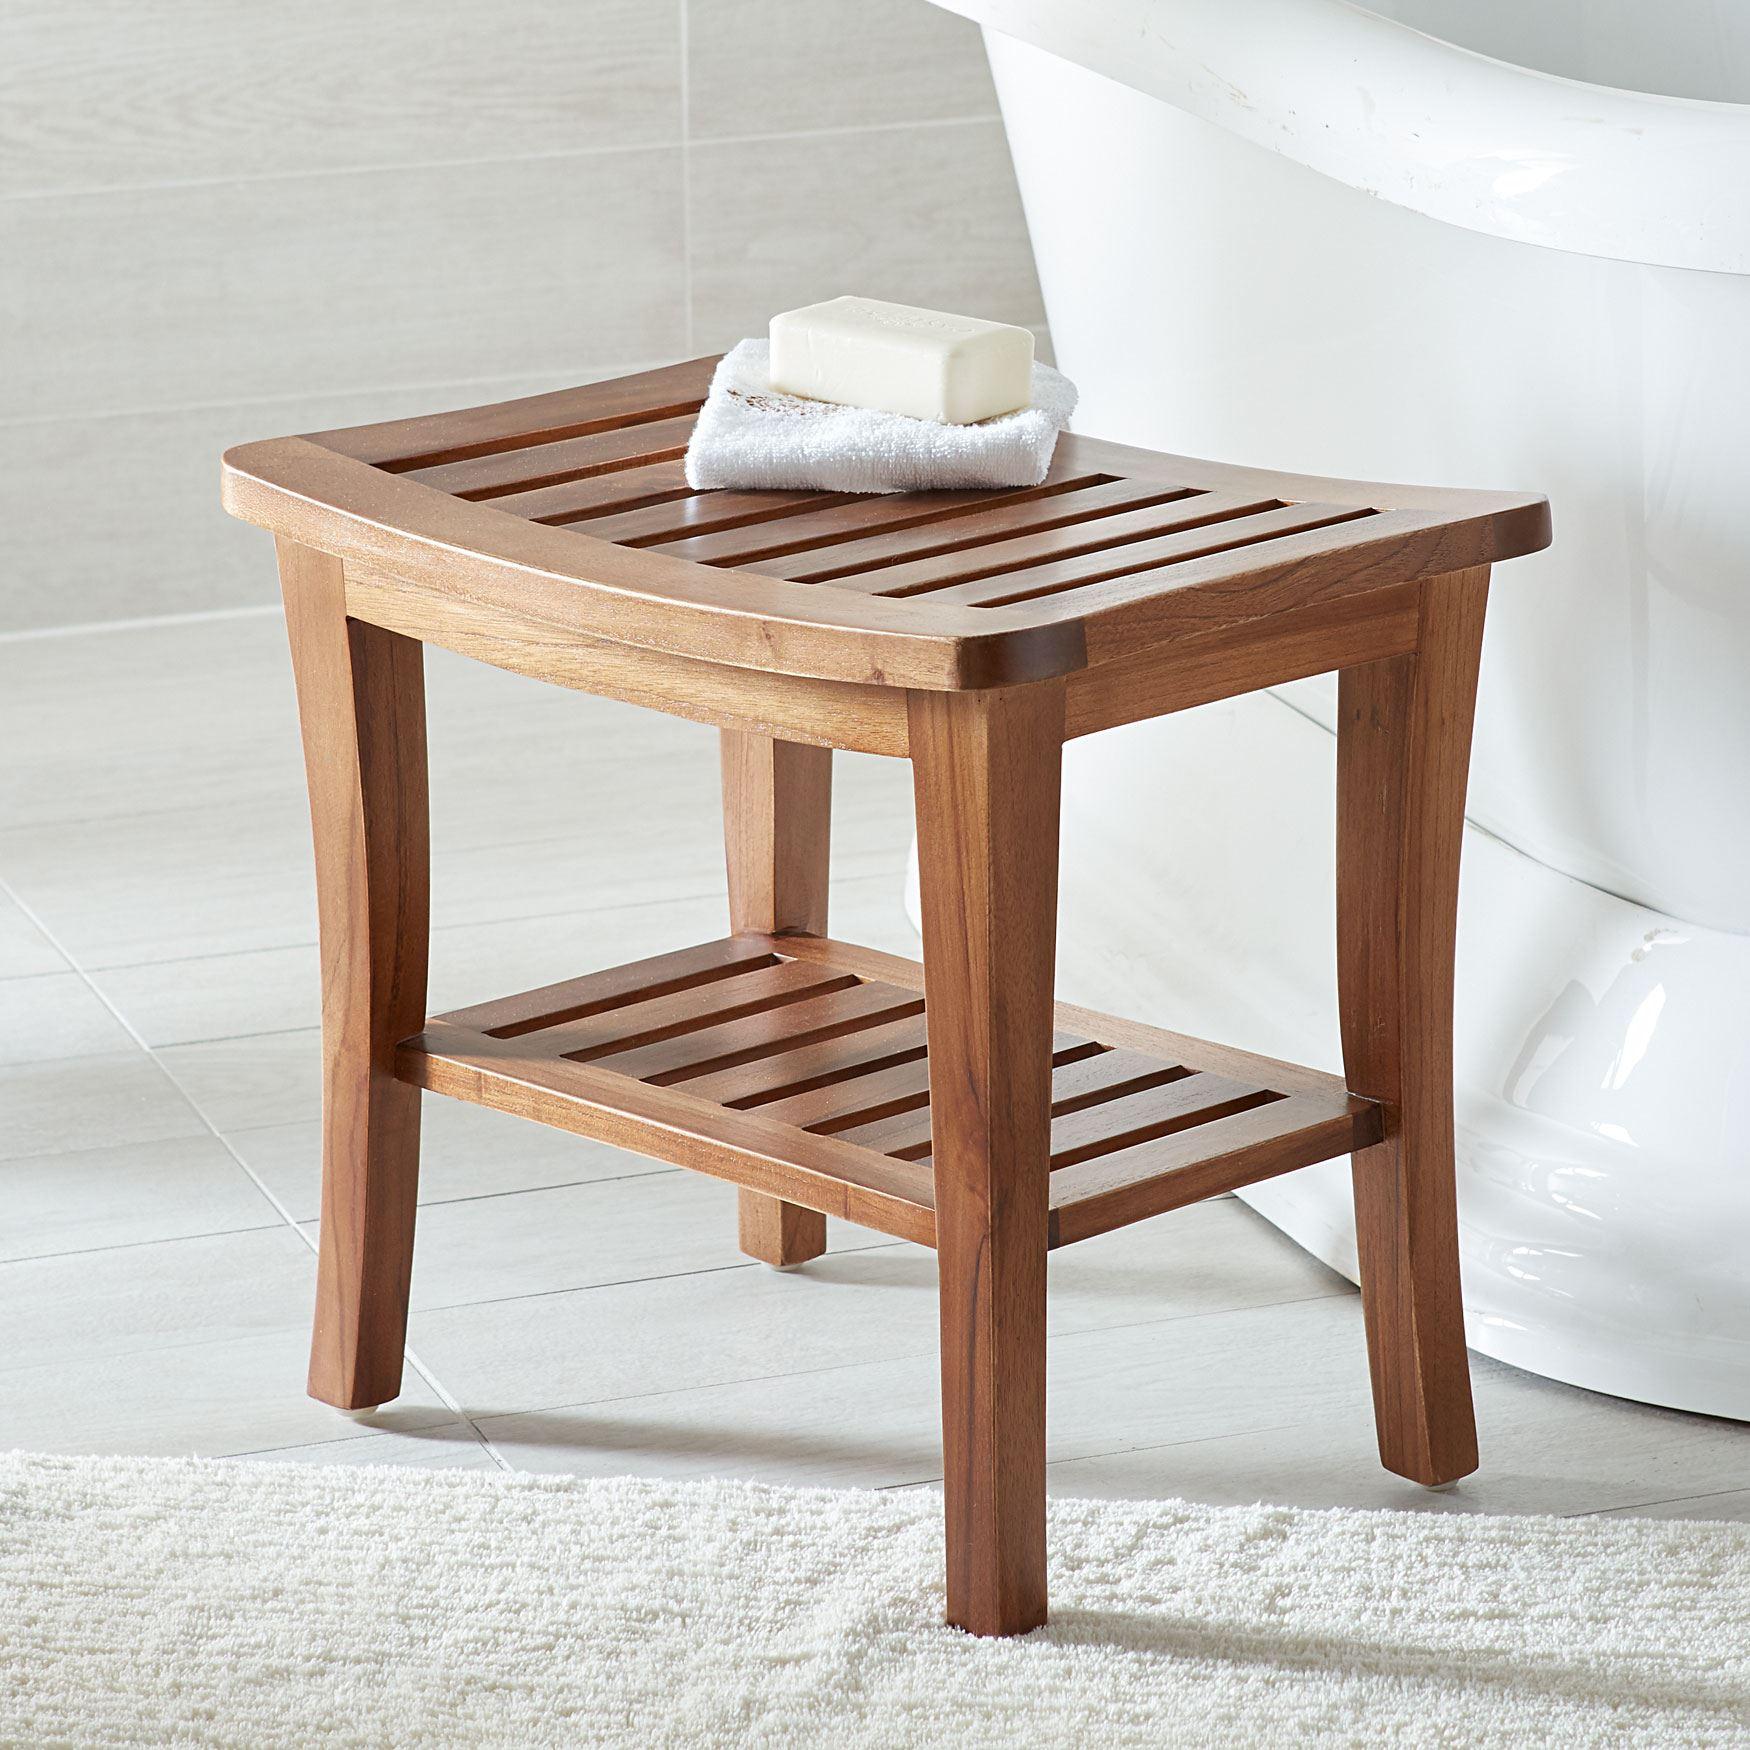 Teak Wood Bath Seat Bench | Bathroom Storage | Brylane Home